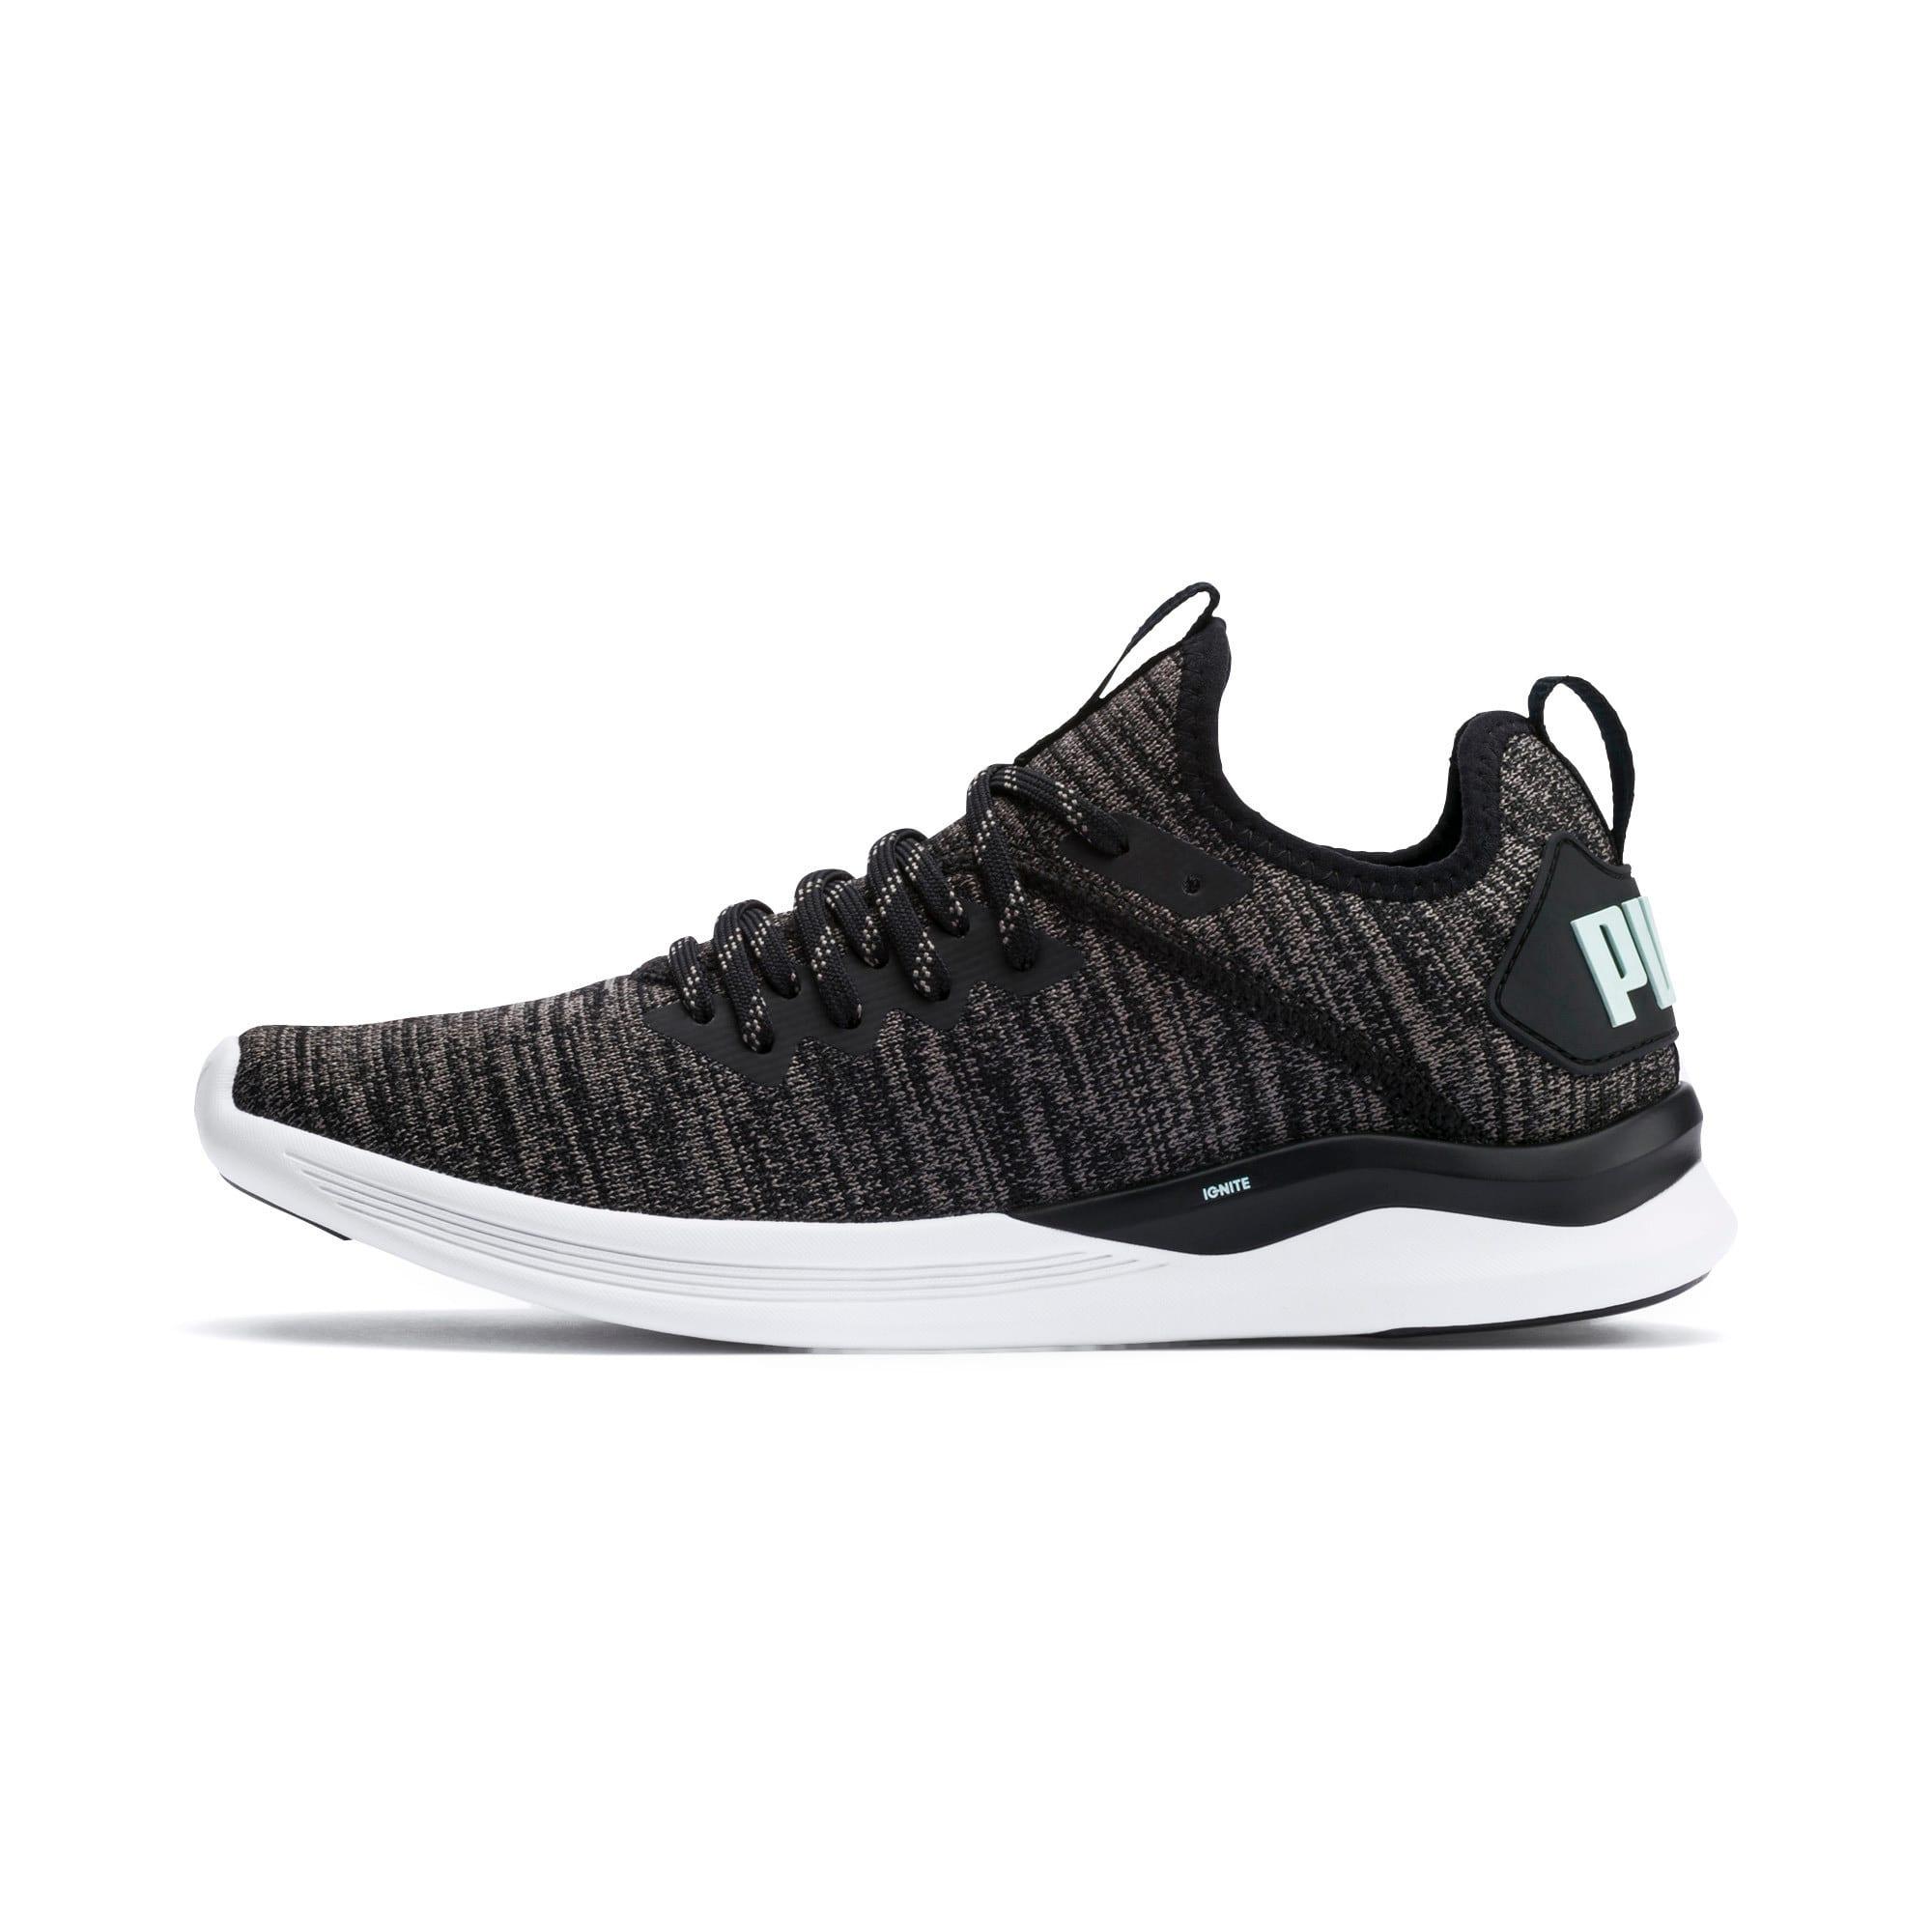 Thumbnail 1 of IGNITE Flash evoKNIT Women's Running Shoes, Black-Charcoal-Fair Aqua, medium